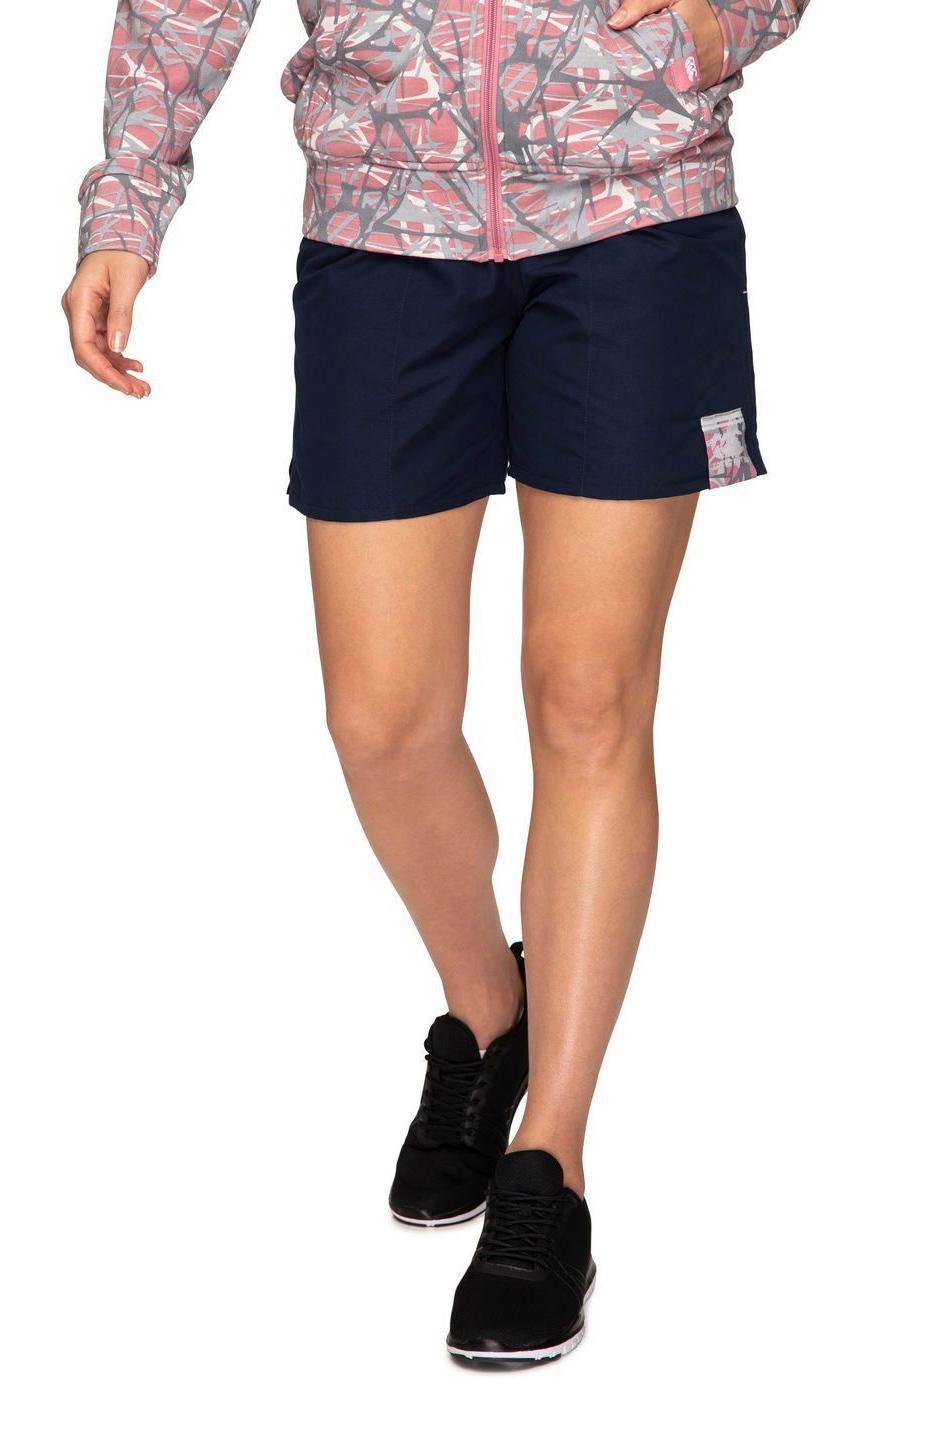 "Womens Camo Logo Tactic Short 5.9"" - Navy (Size 12) image"